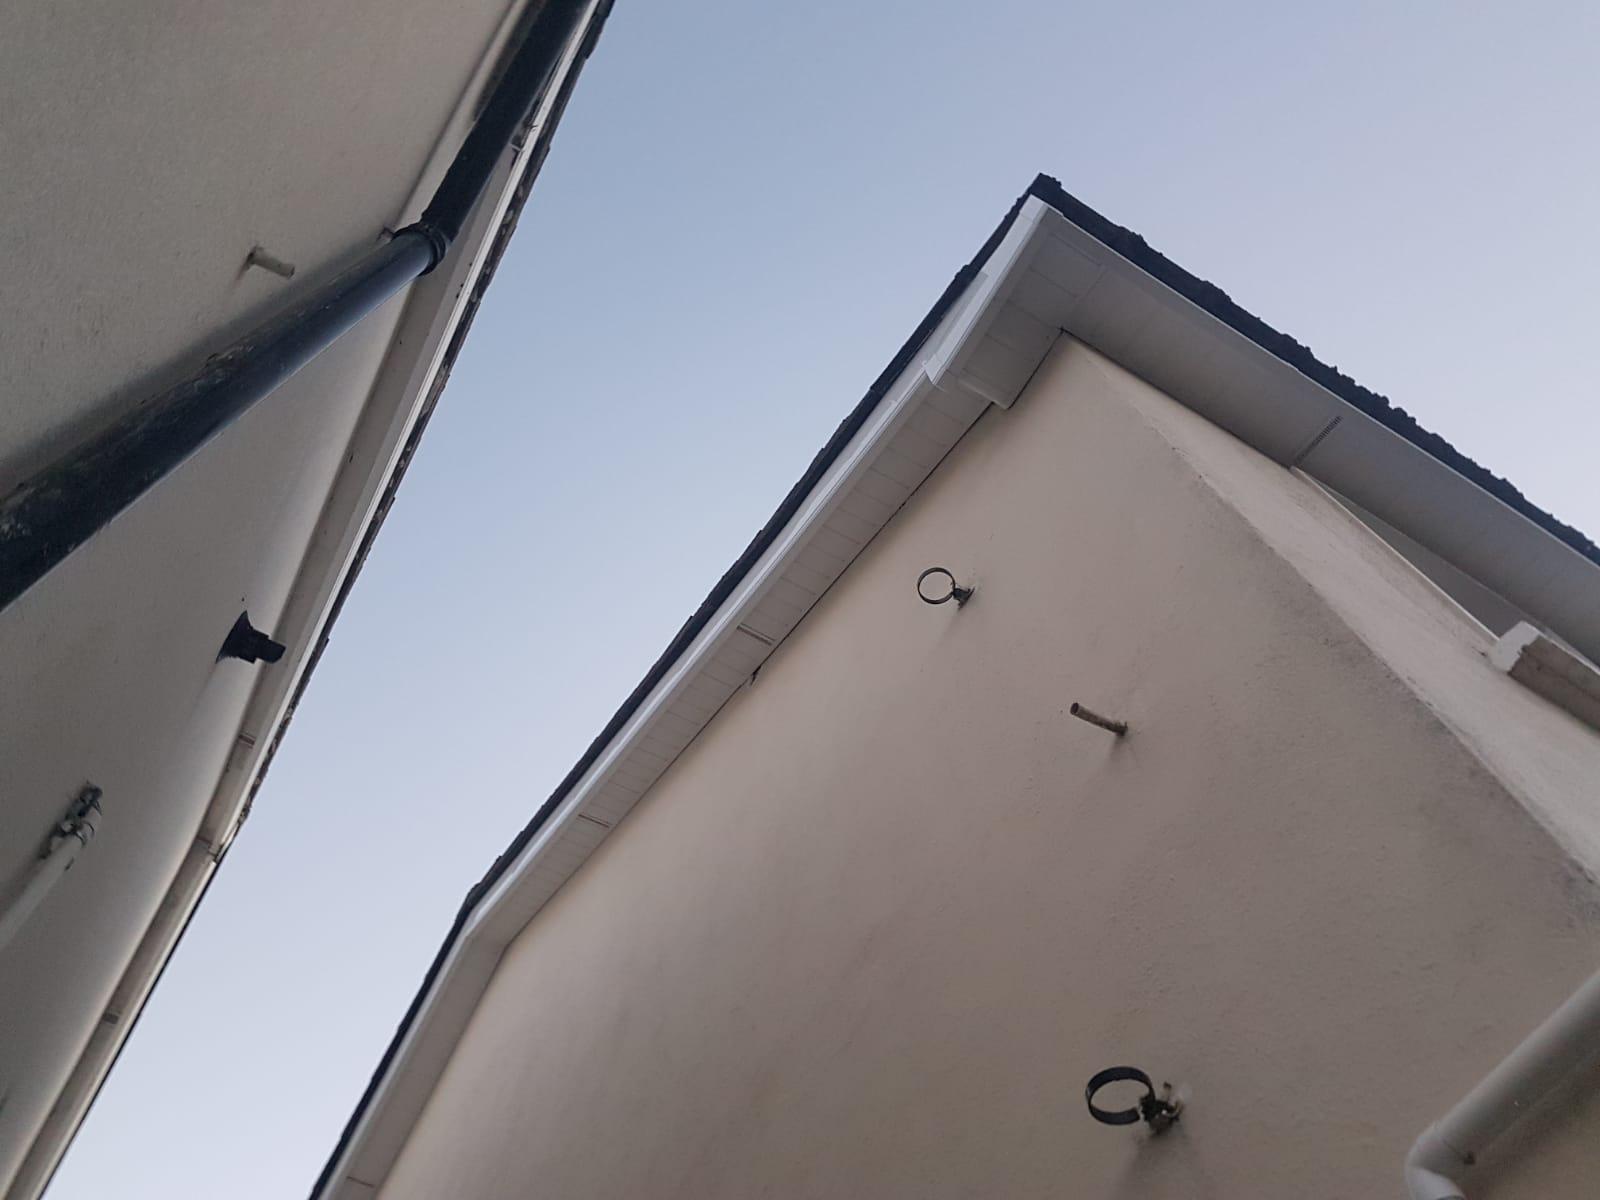 Gutter Repairs in Clane, Co. Kildare